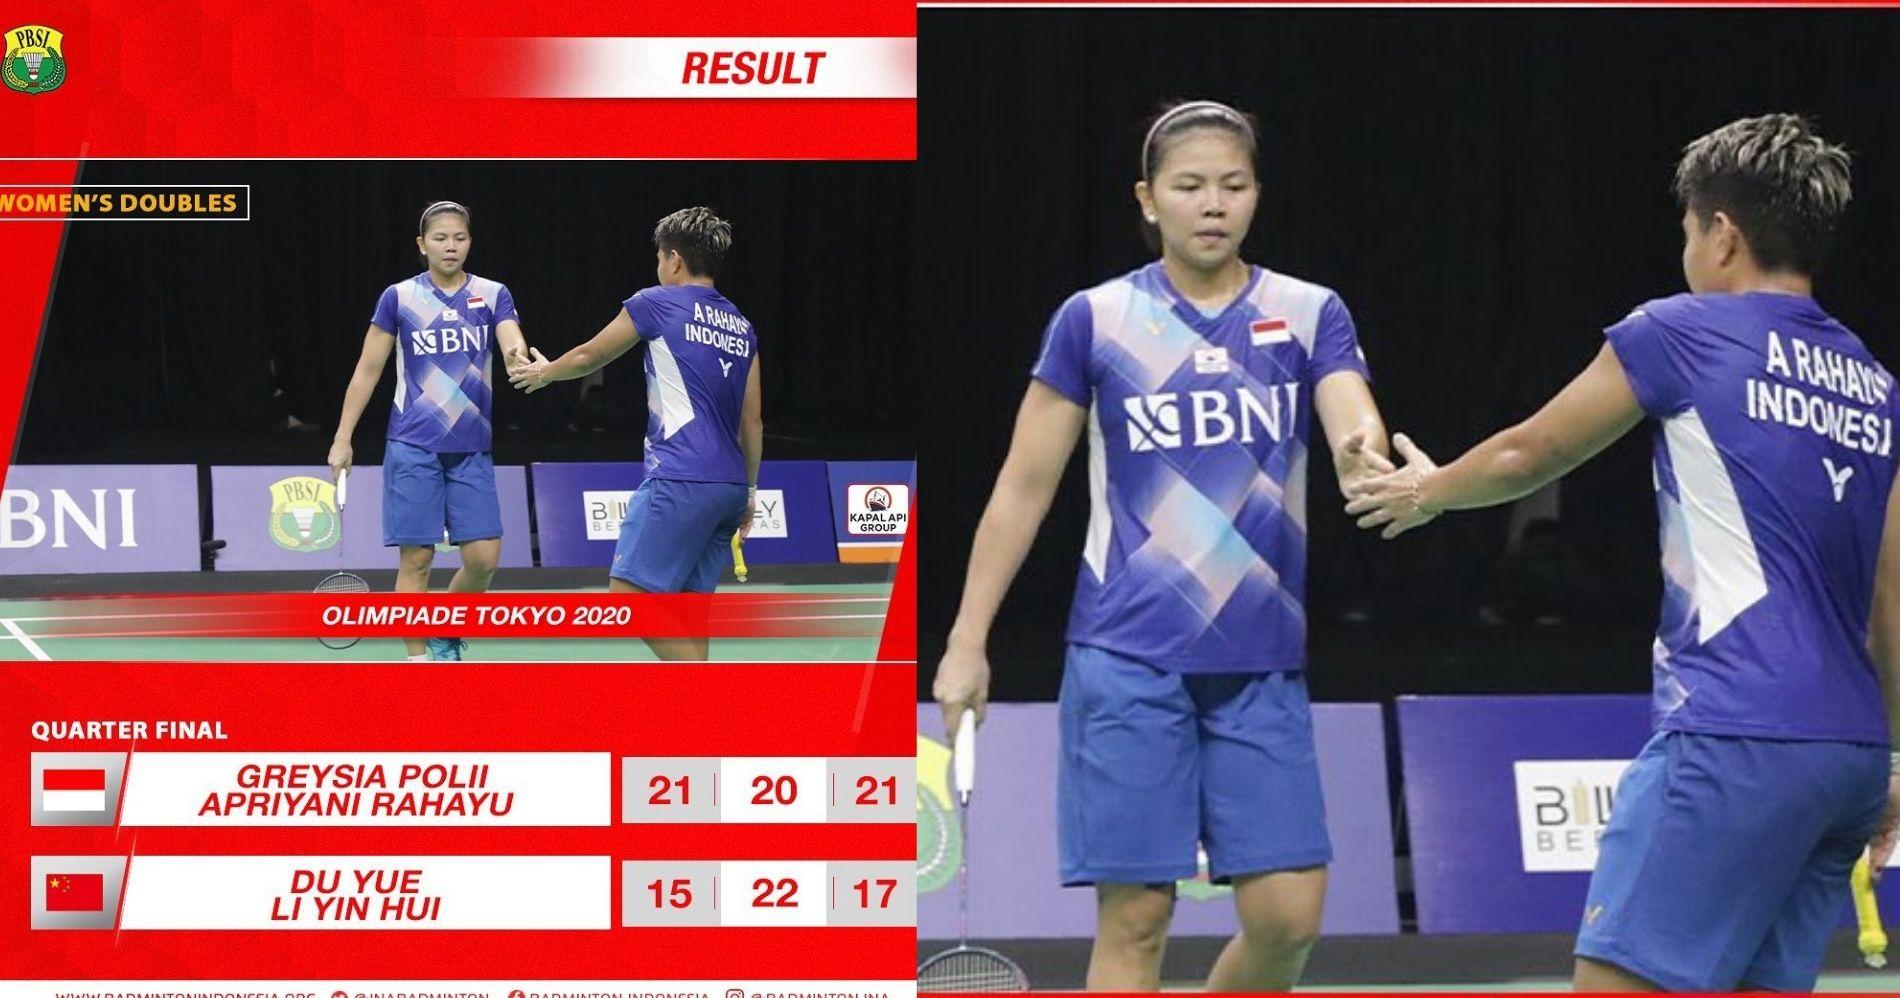 Badminton Indonesia (@badminton.ina) • Foto dan video Instagram